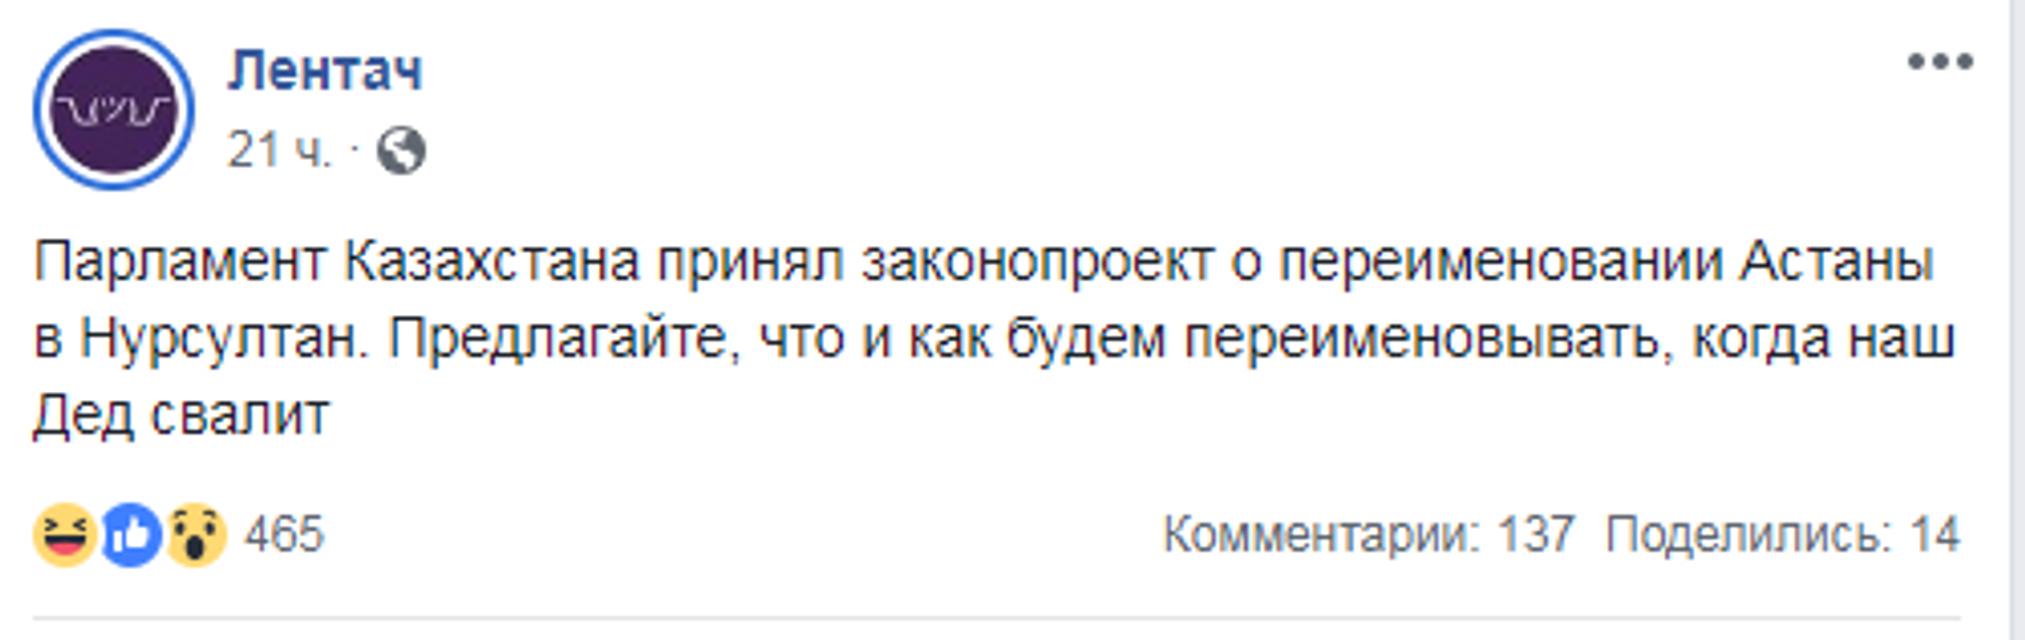 Х*йлобад: россияне 'переименуют' Москву в честь Путина - фото 177088